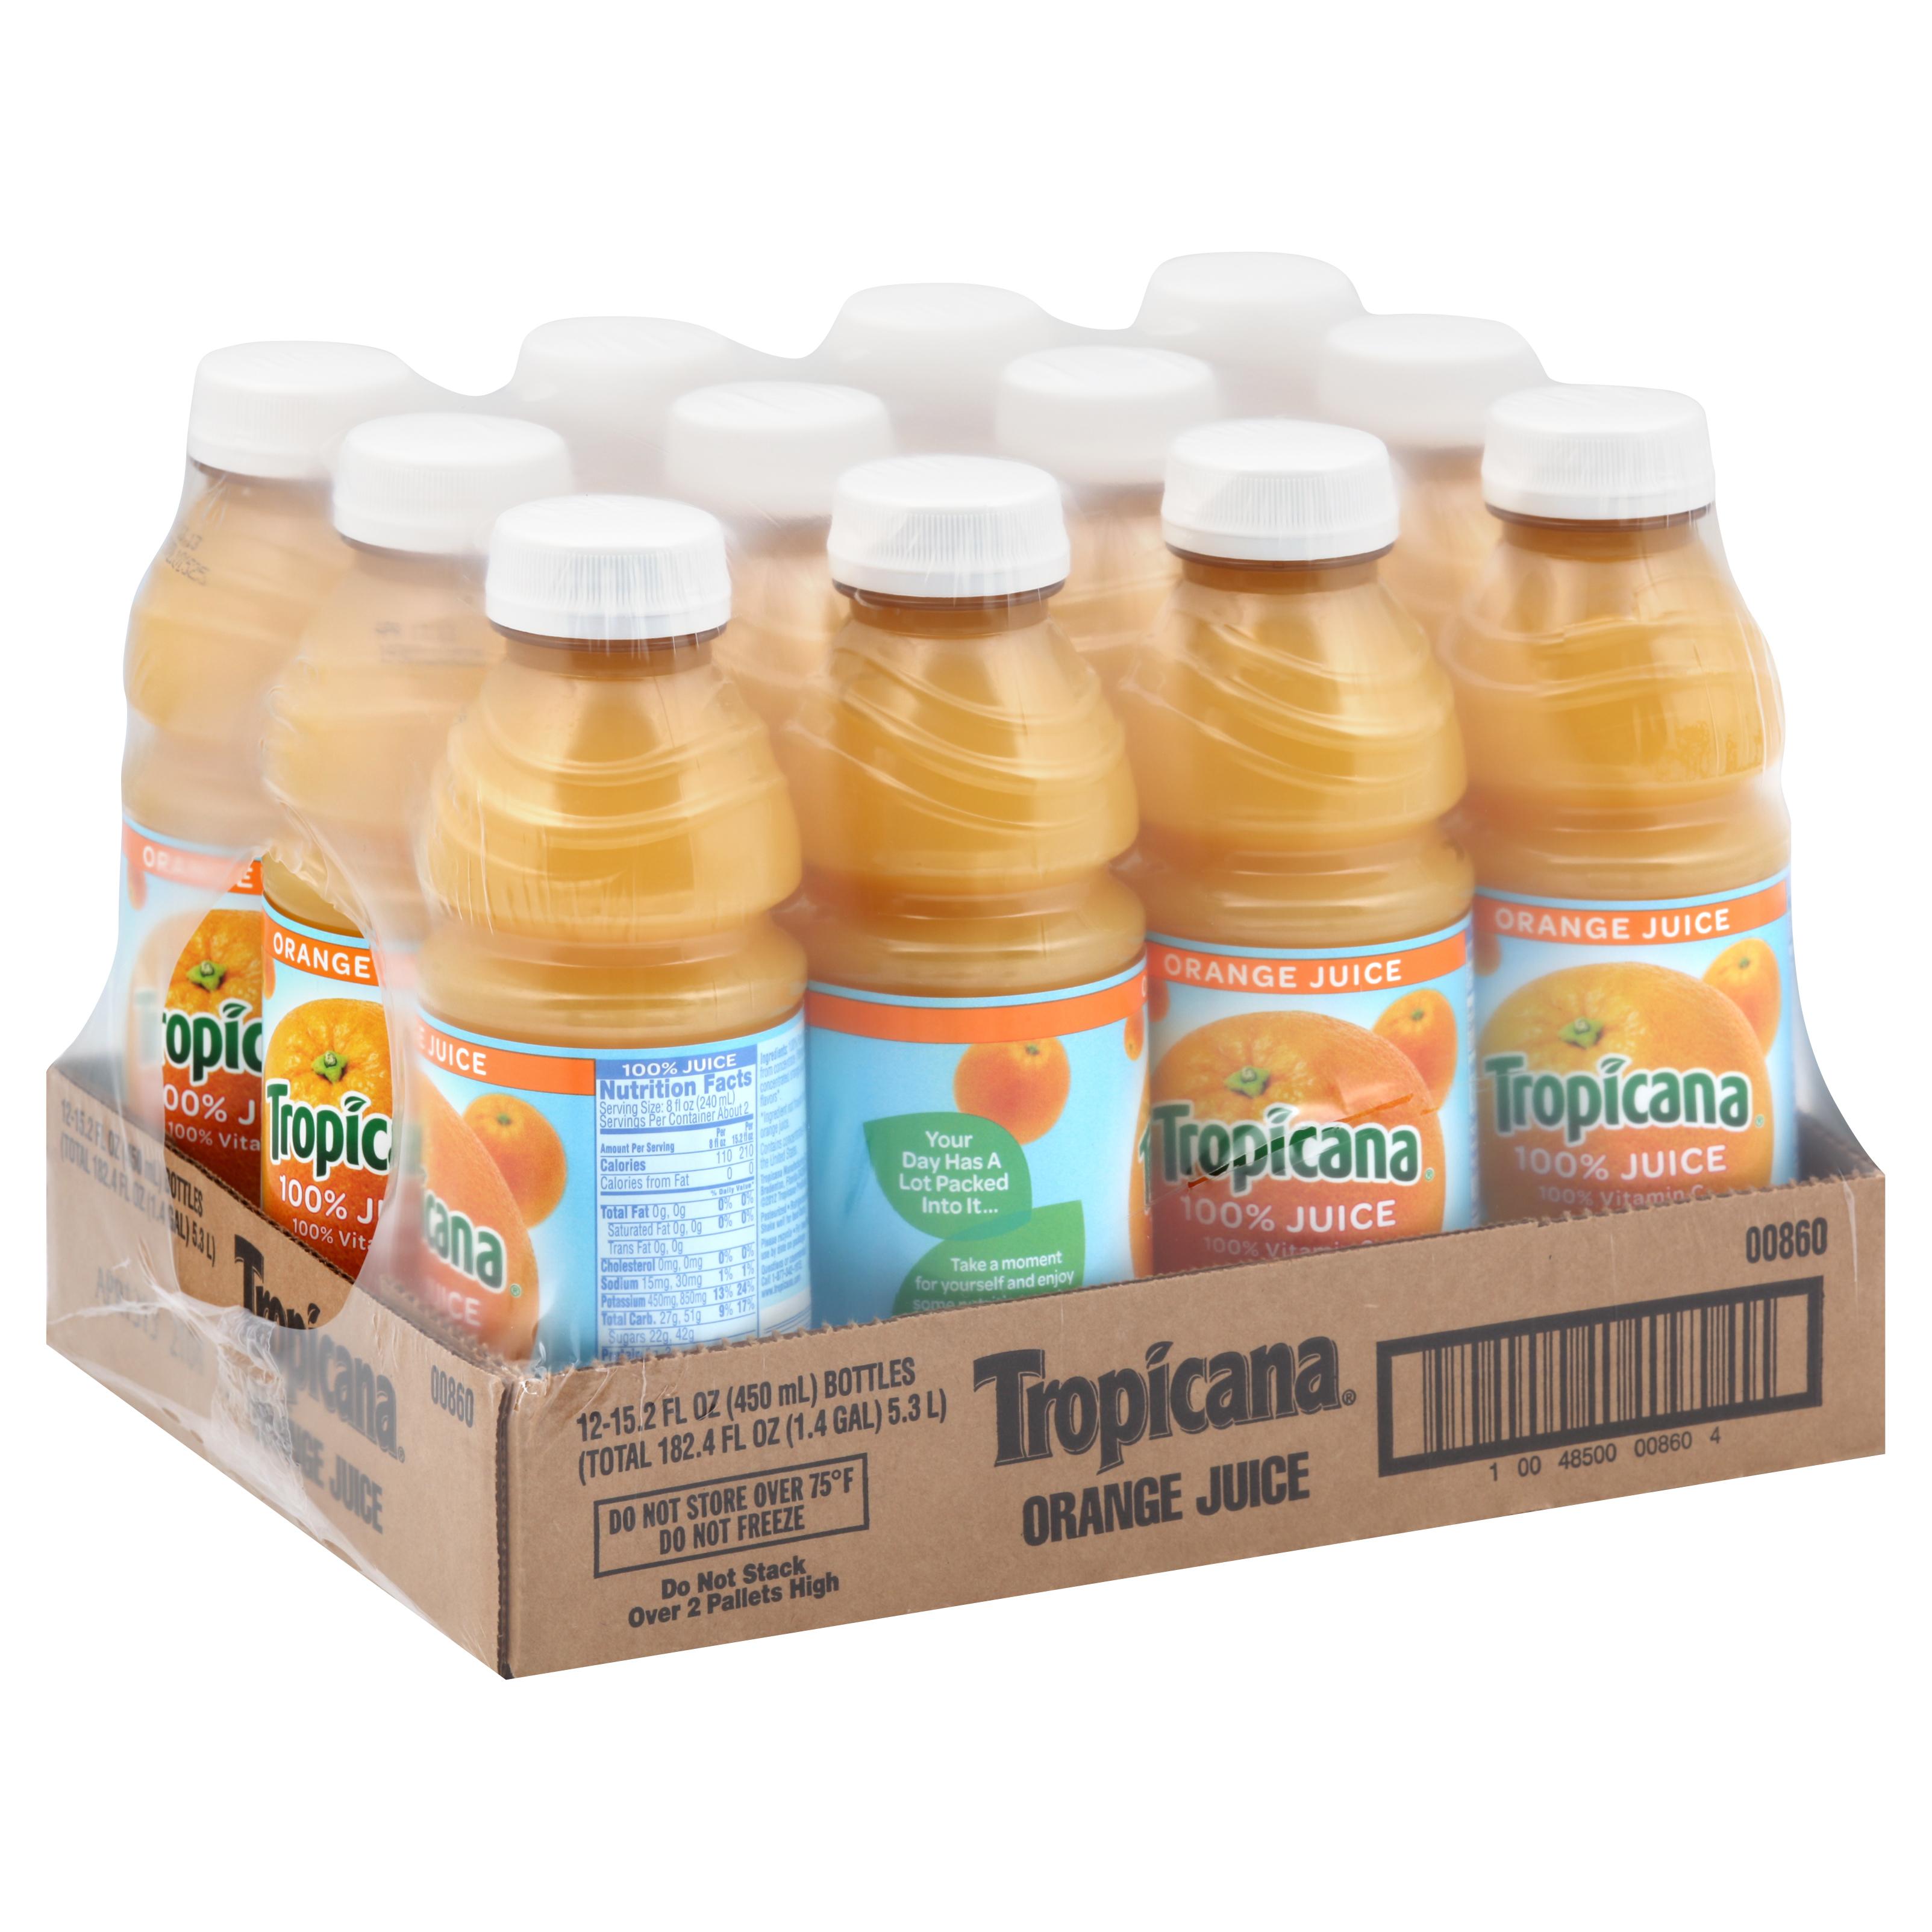 Tropicana s orange juice value proposition